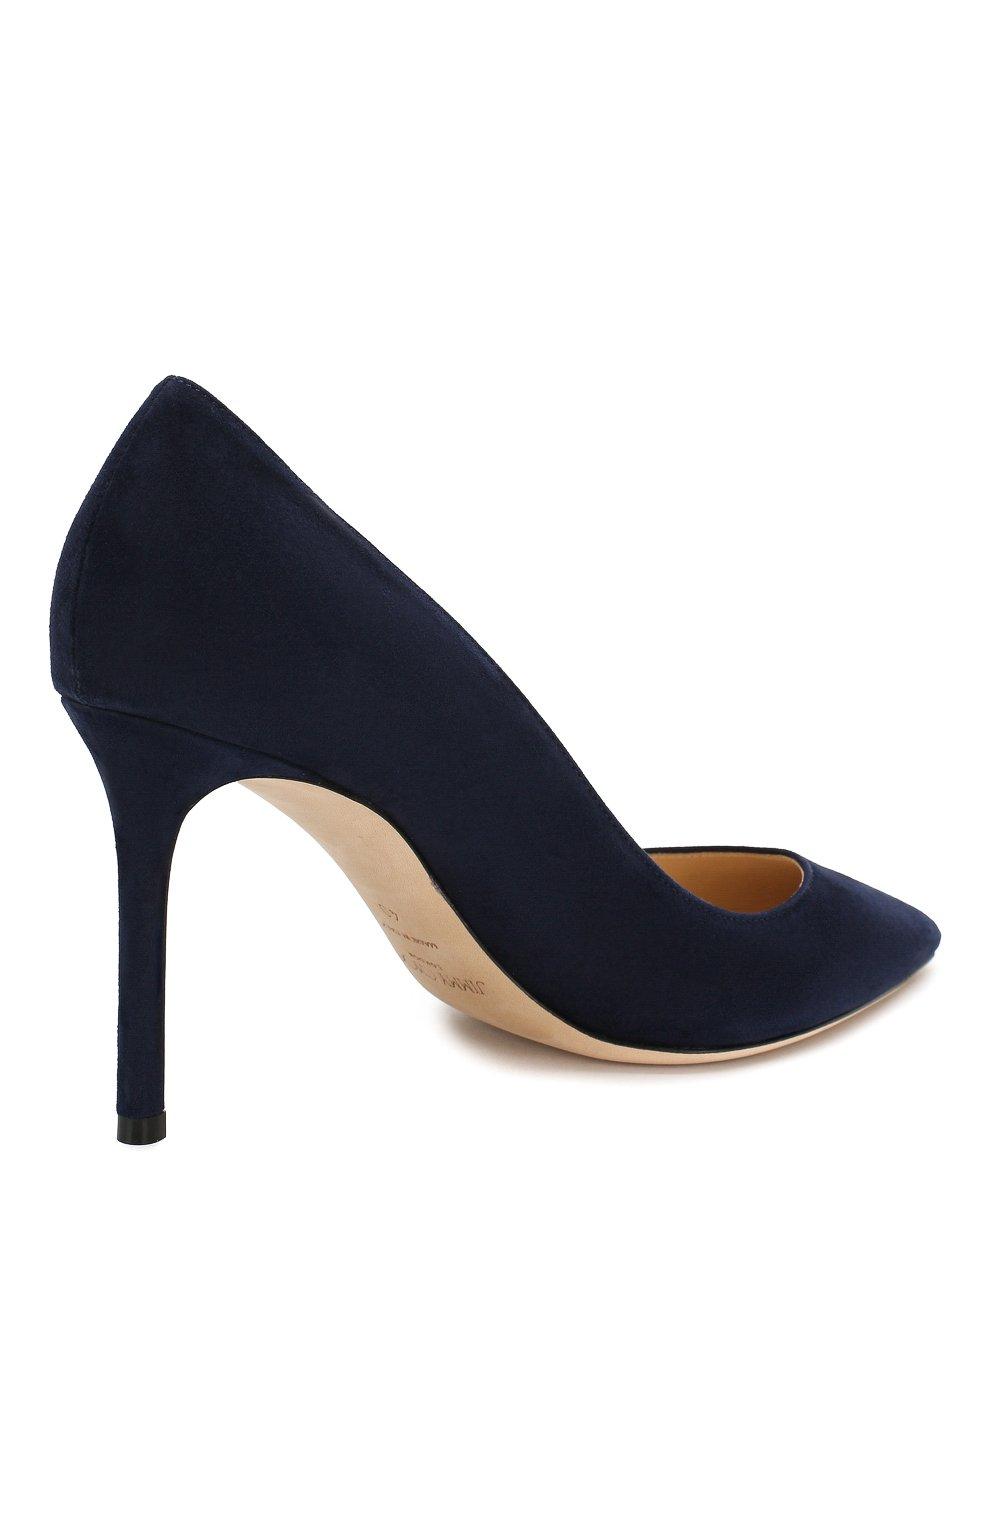 Женские замшевые туфли romy 85 JIMMY CHOO темно-синего цвета, арт. R0MY 85/SUE | Фото 4